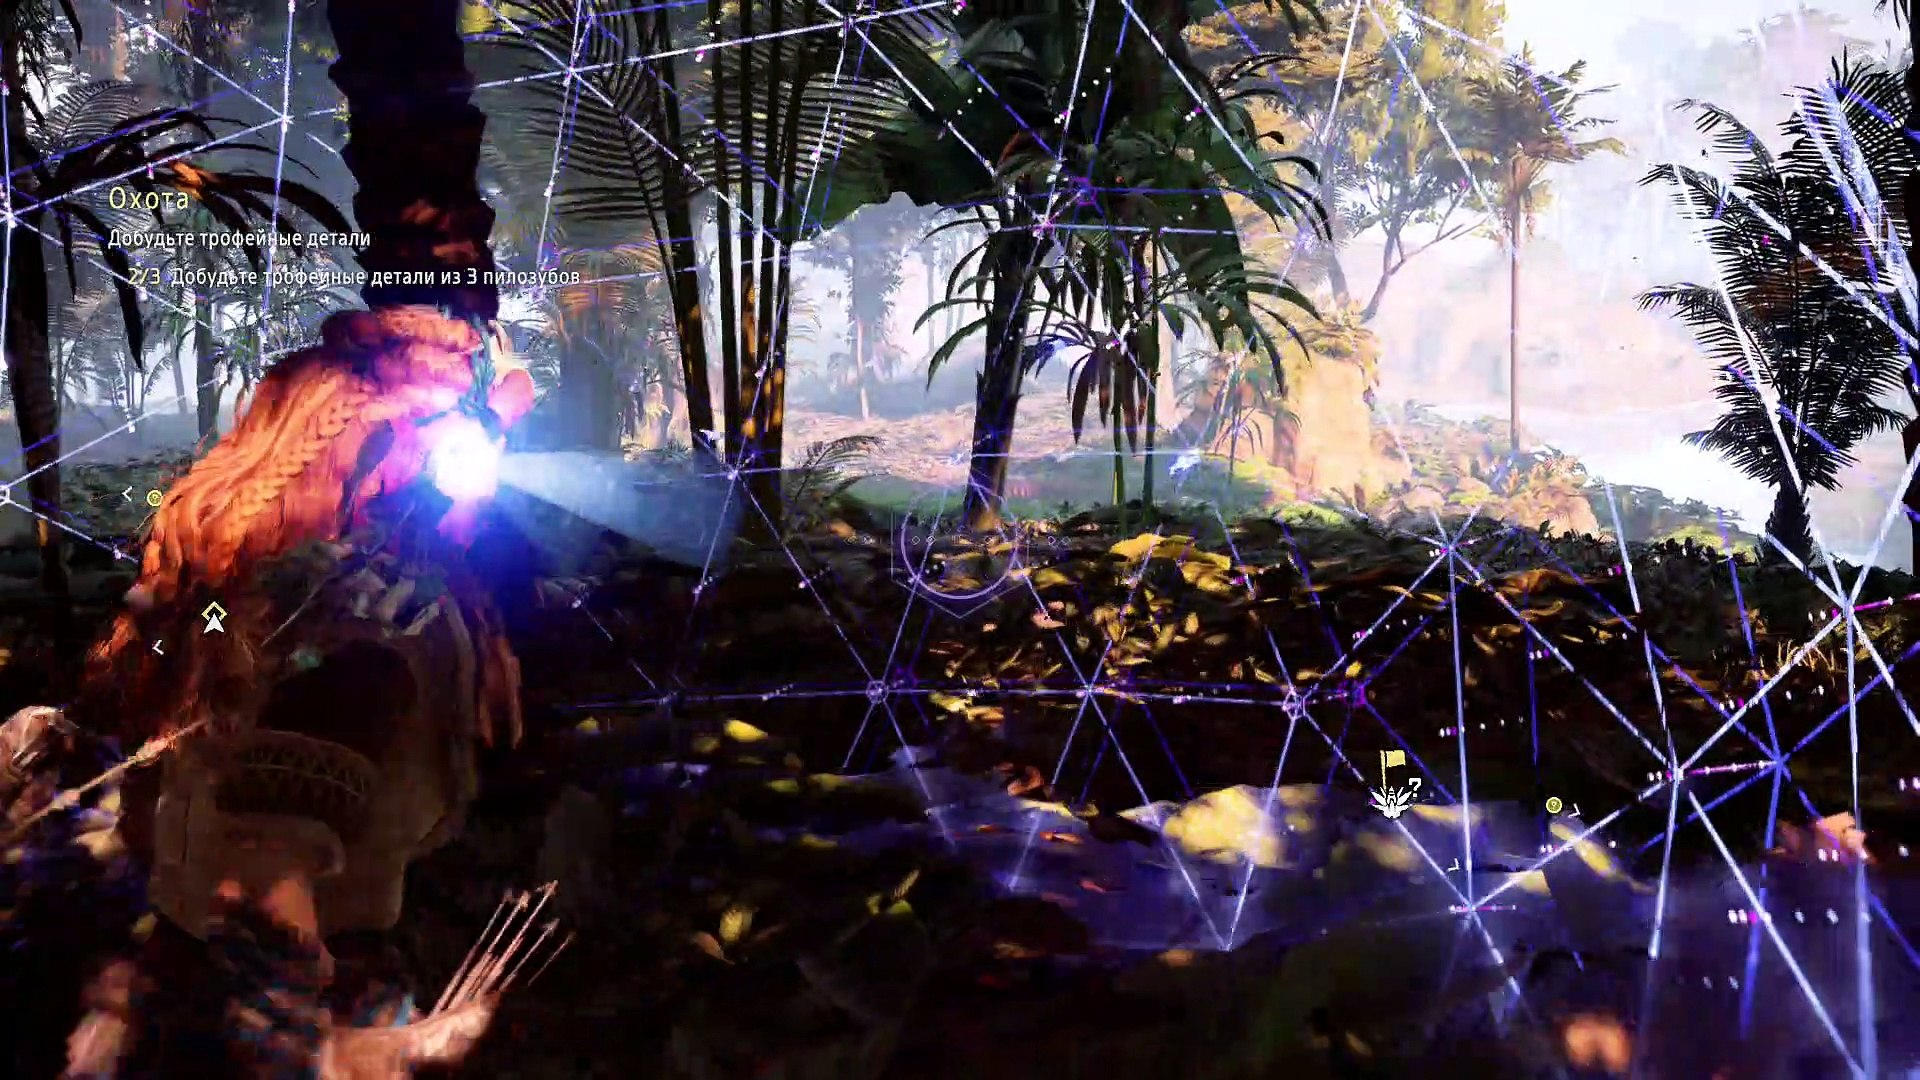 Horizon Zero Dawn #43 — Испытание Охота Бревна {PS4} прохождение часть 43